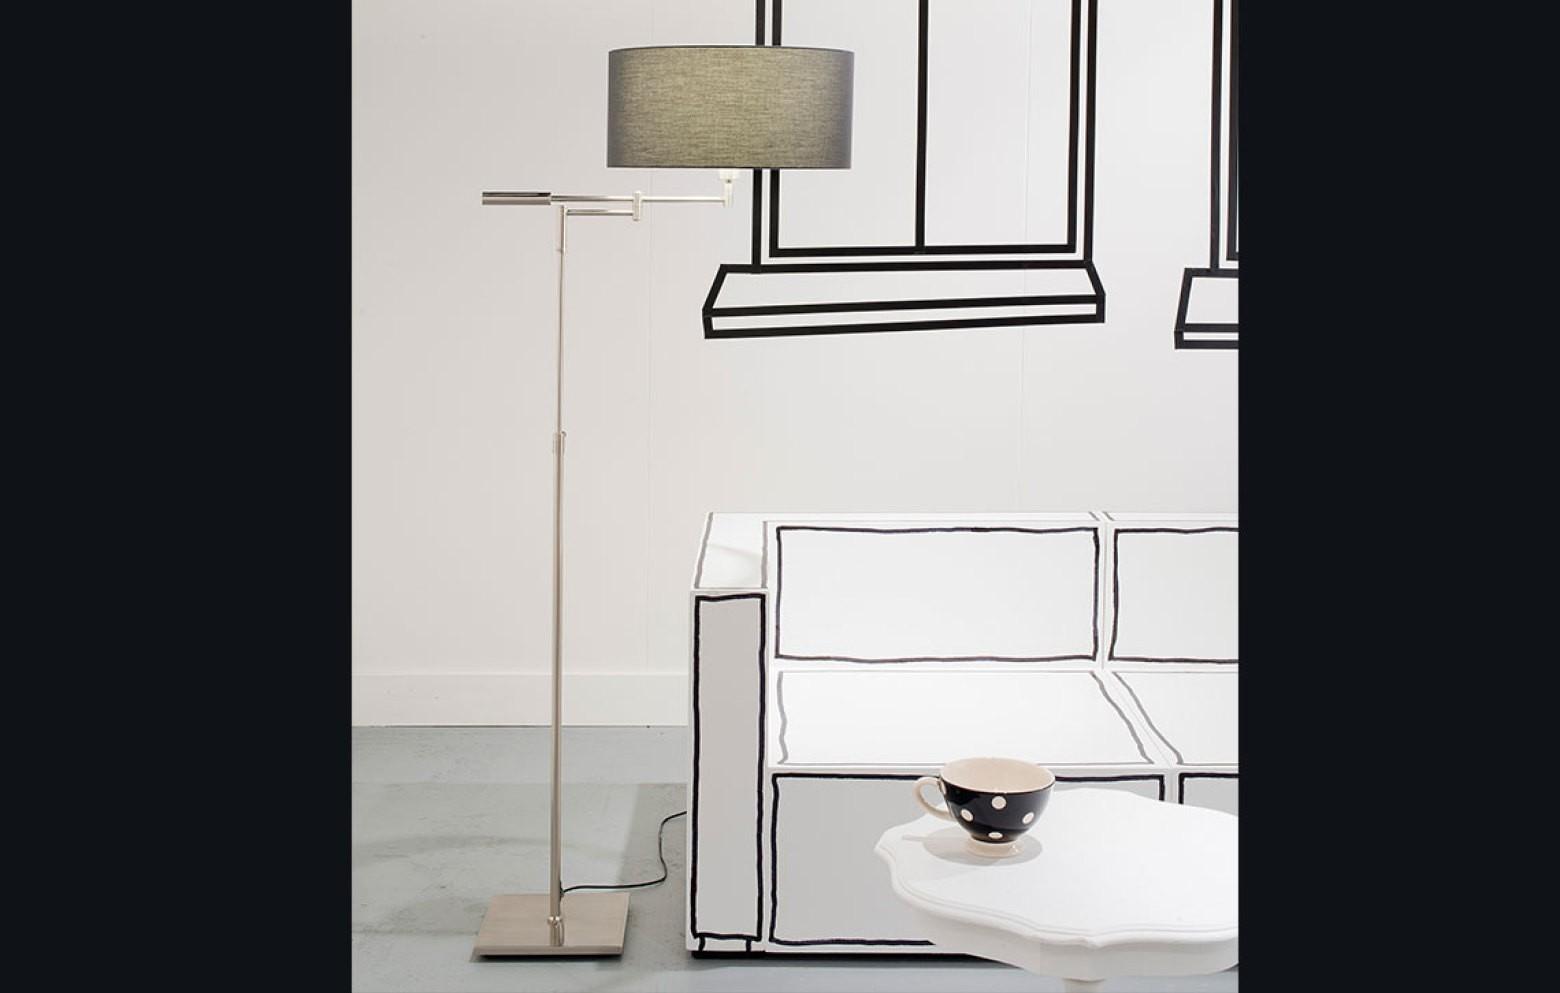 berlin lampen kleinm bel accessoires who 39 s perfect. Black Bedroom Furniture Sets. Home Design Ideas